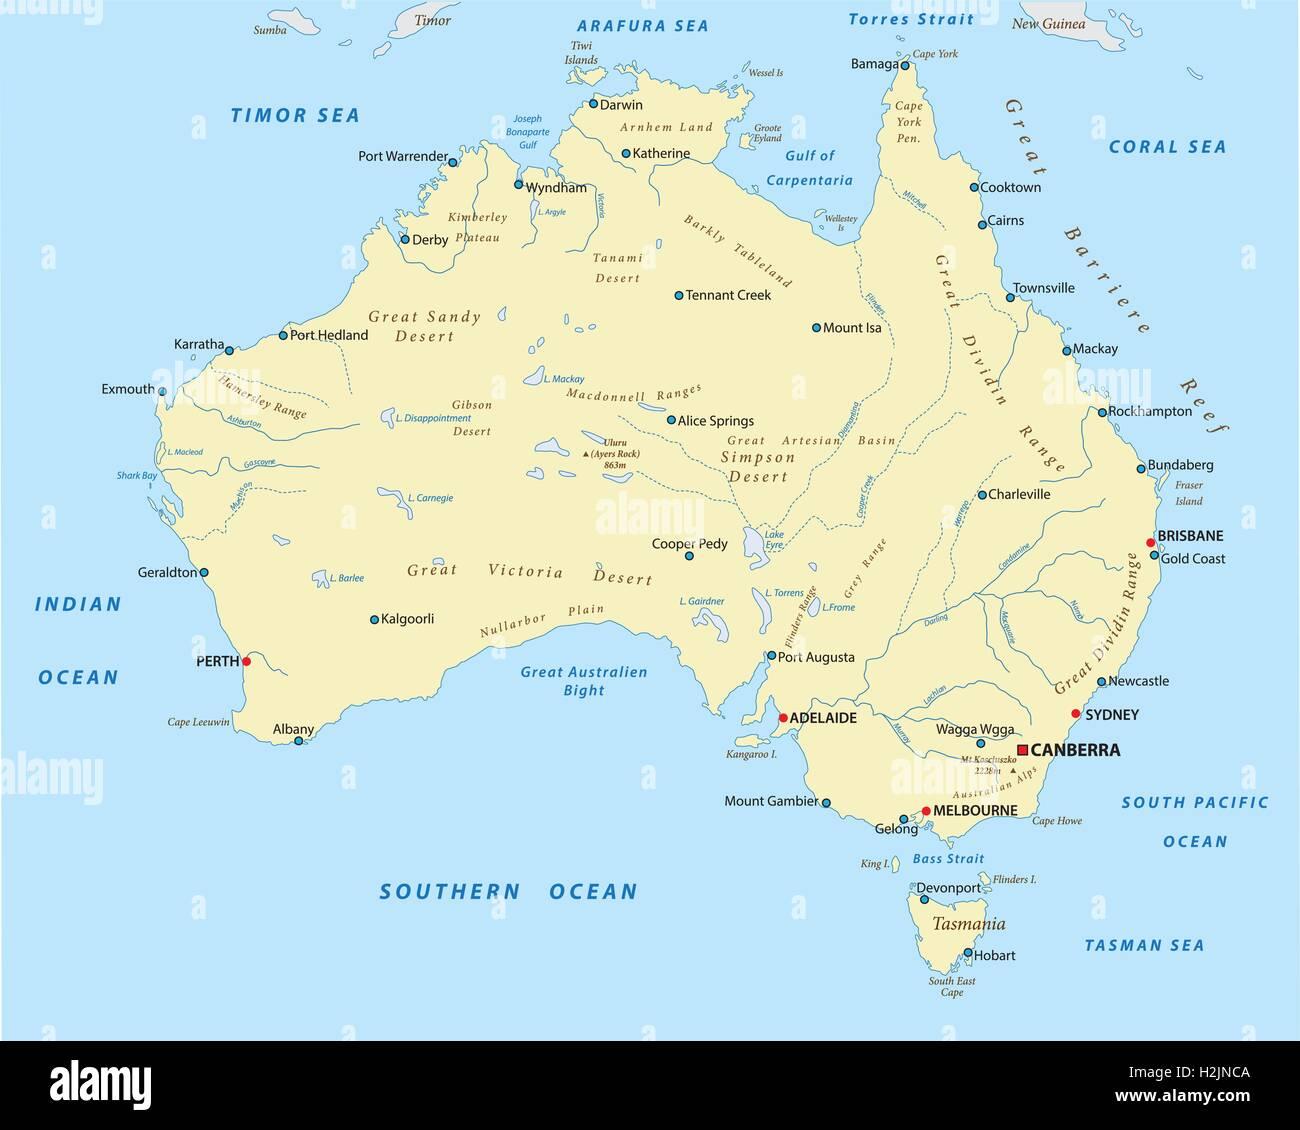 Map Of Australian Landscapes.Australia Landscape Map Stock Vector Art Illustration Vector